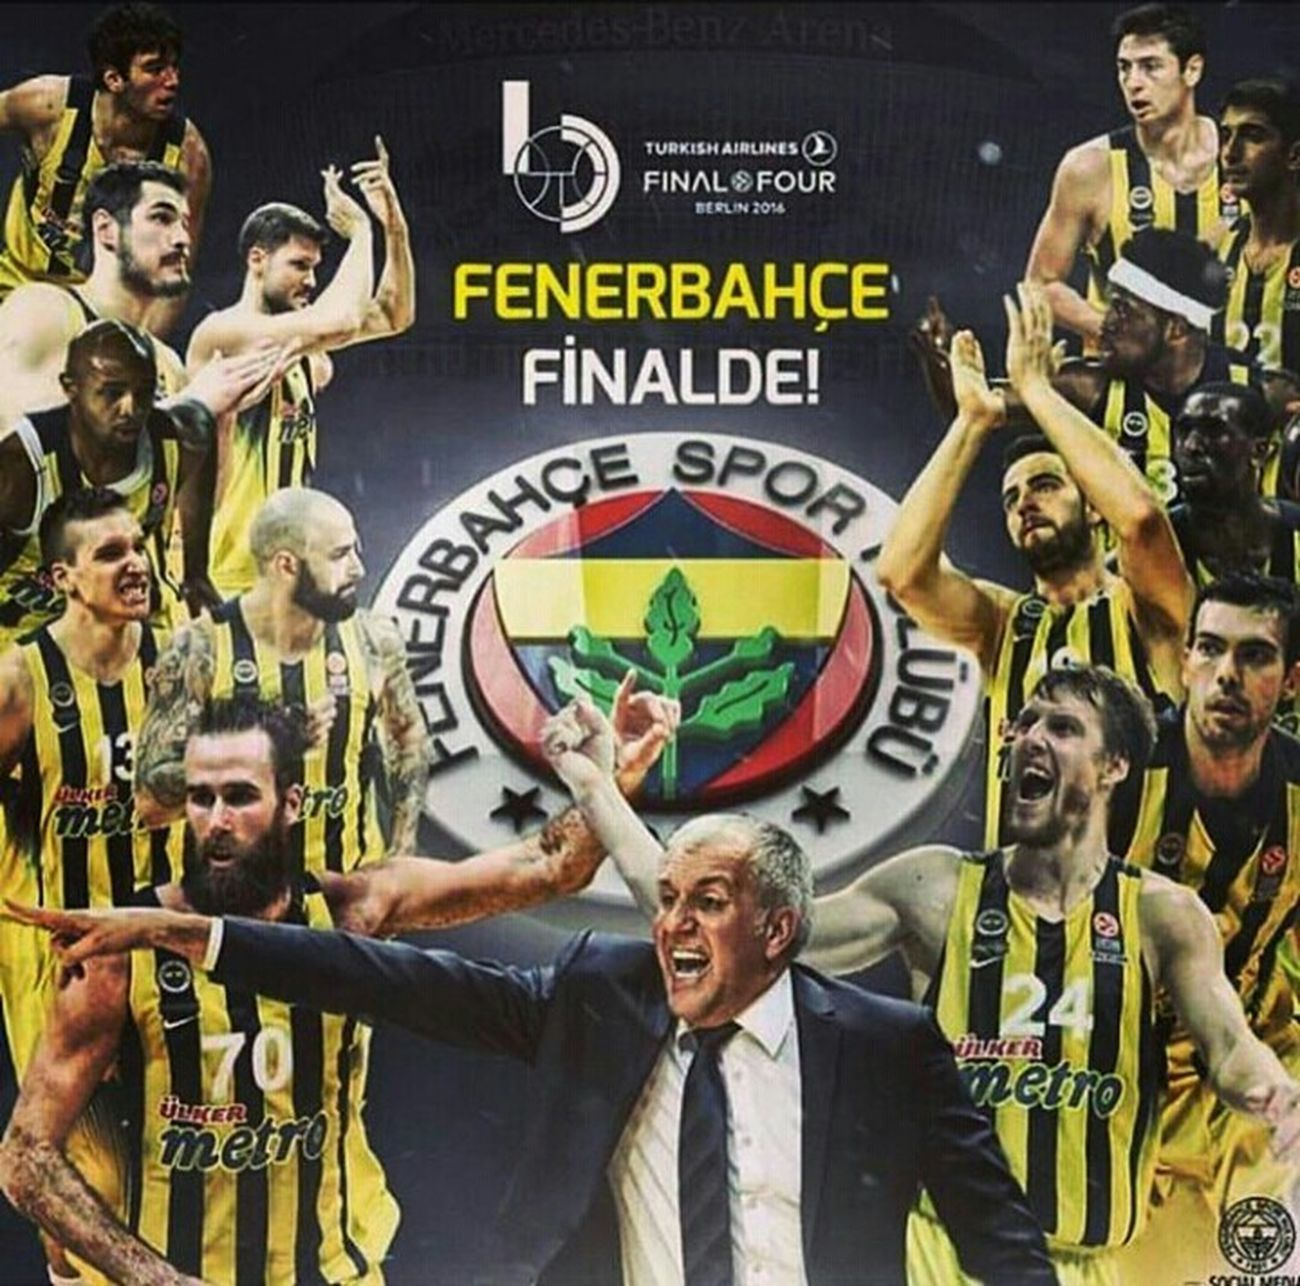 F4glory Finalfour Euroleague Fenerbahce  Fbbasketbol Fenerbahçe SK Fenerbahcem Basketball